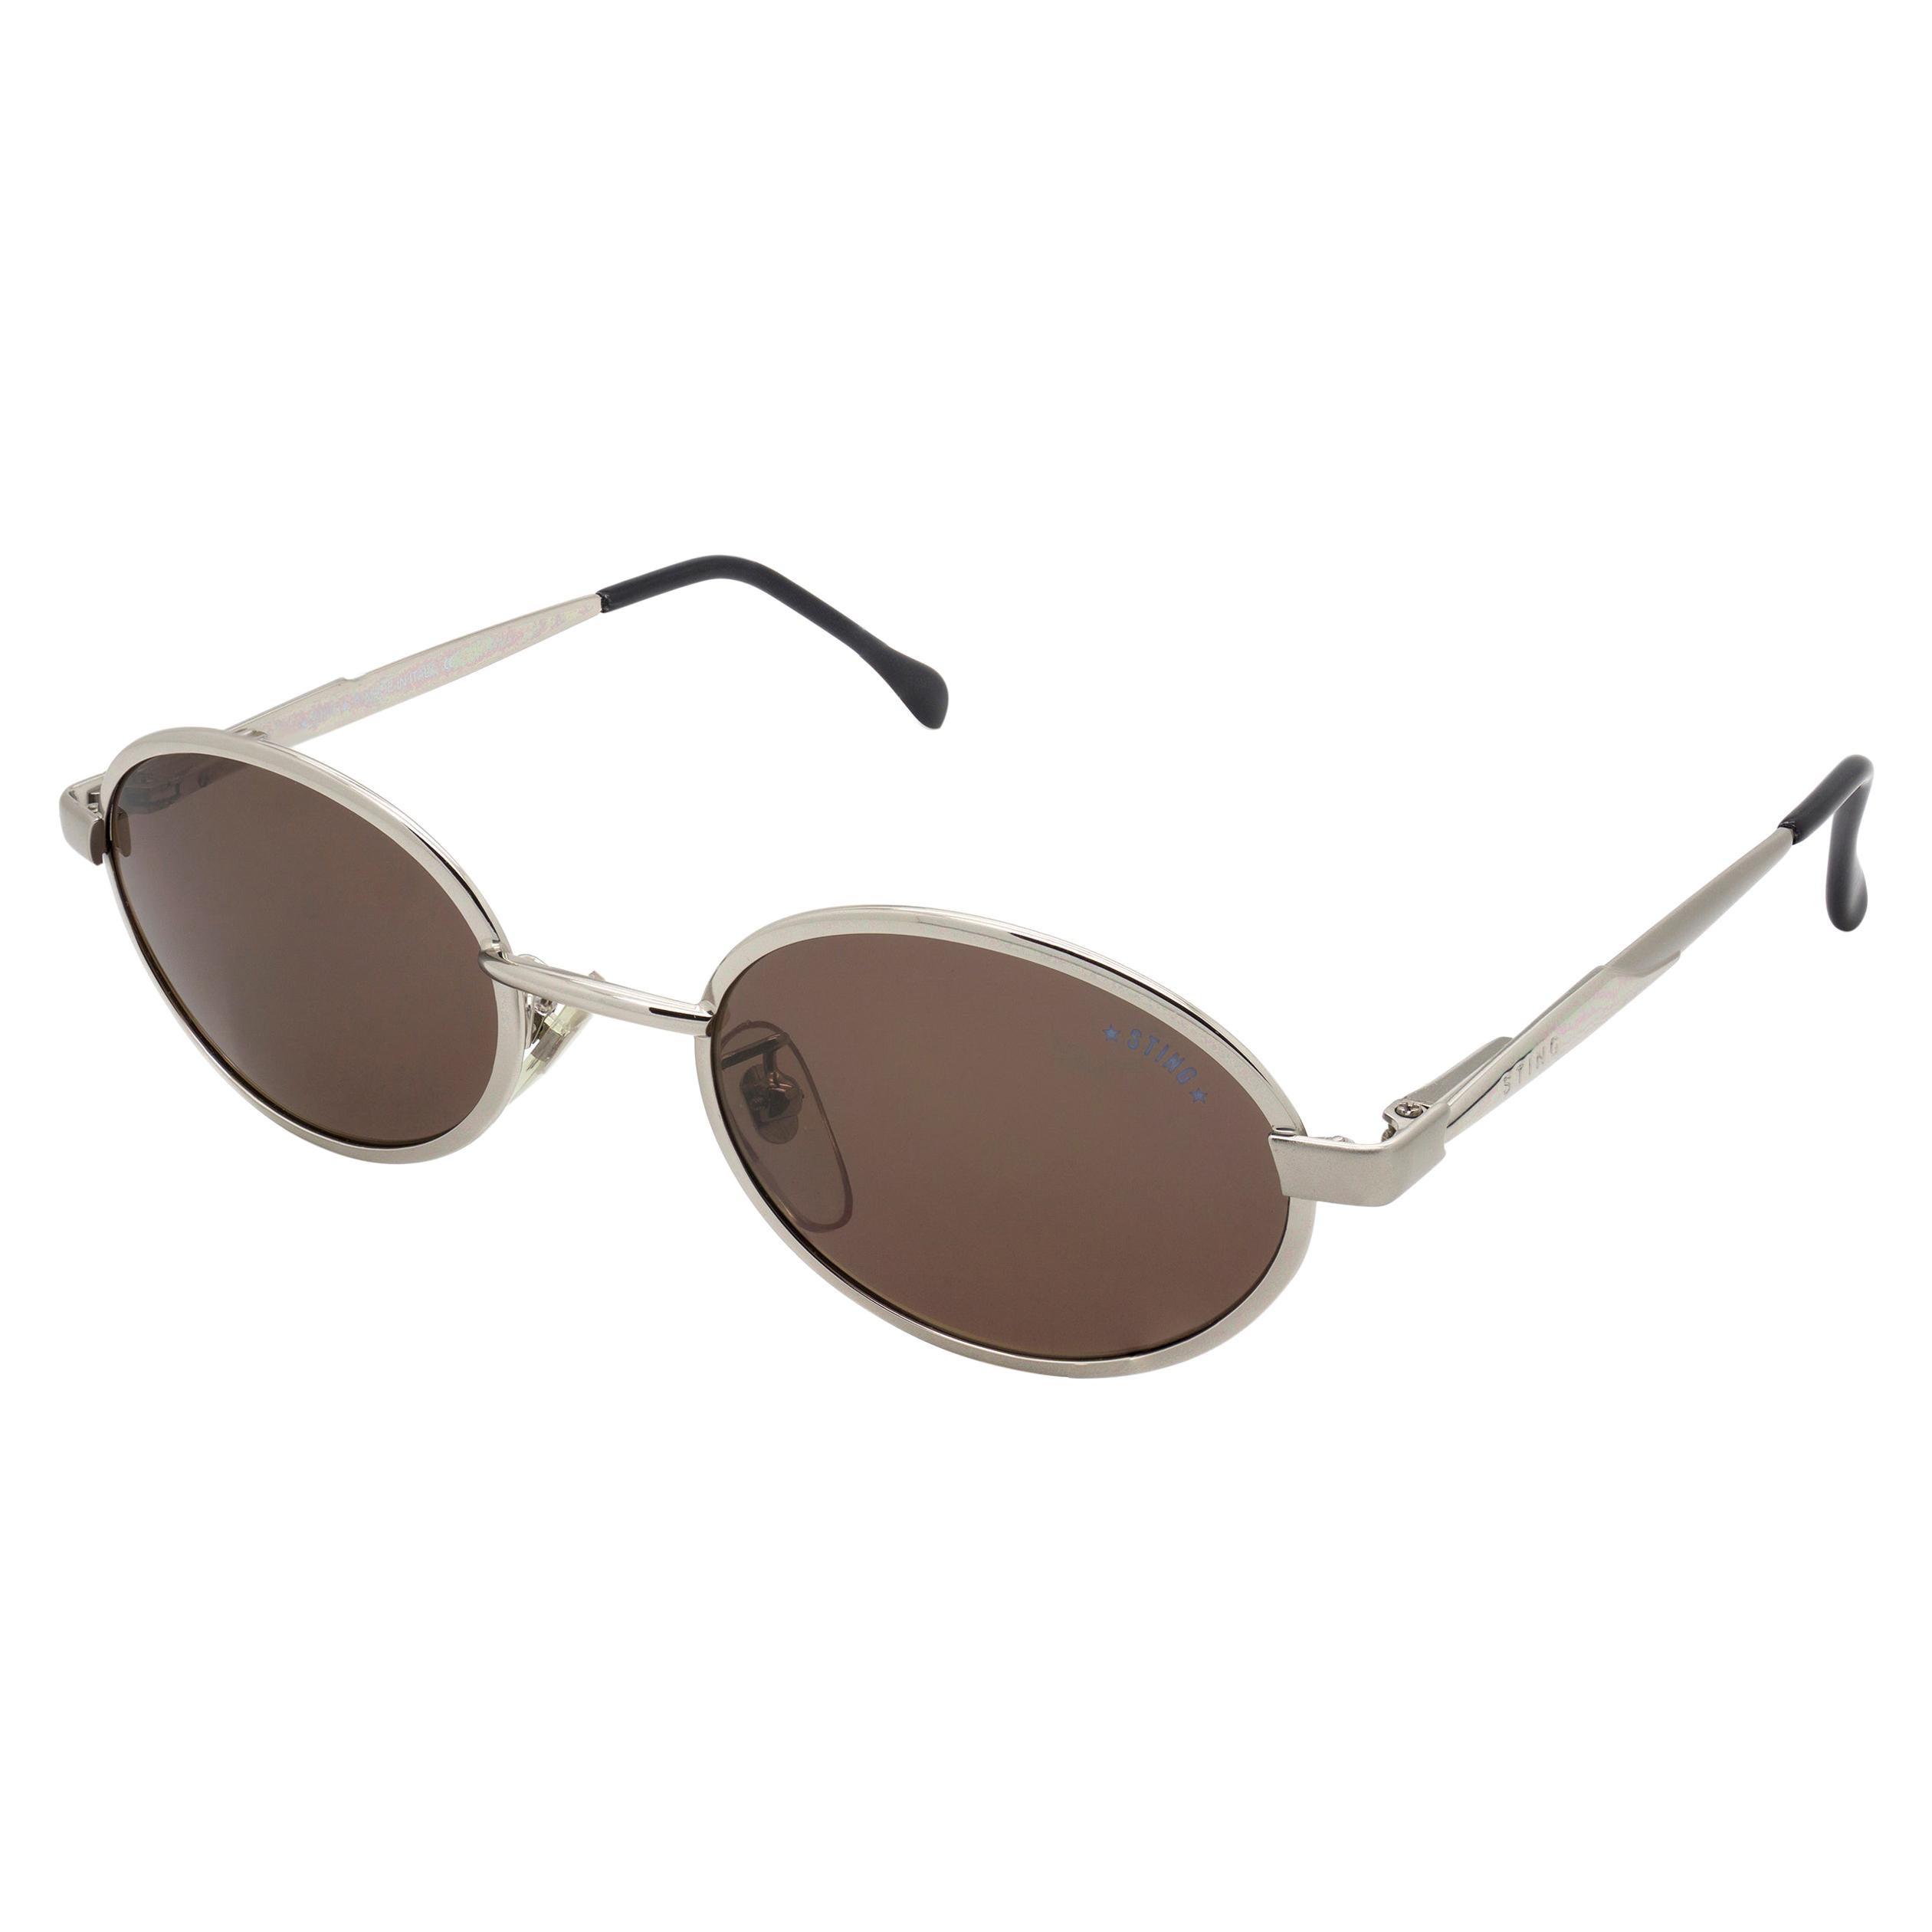 Sting oval vintage sunglasses spring hinges